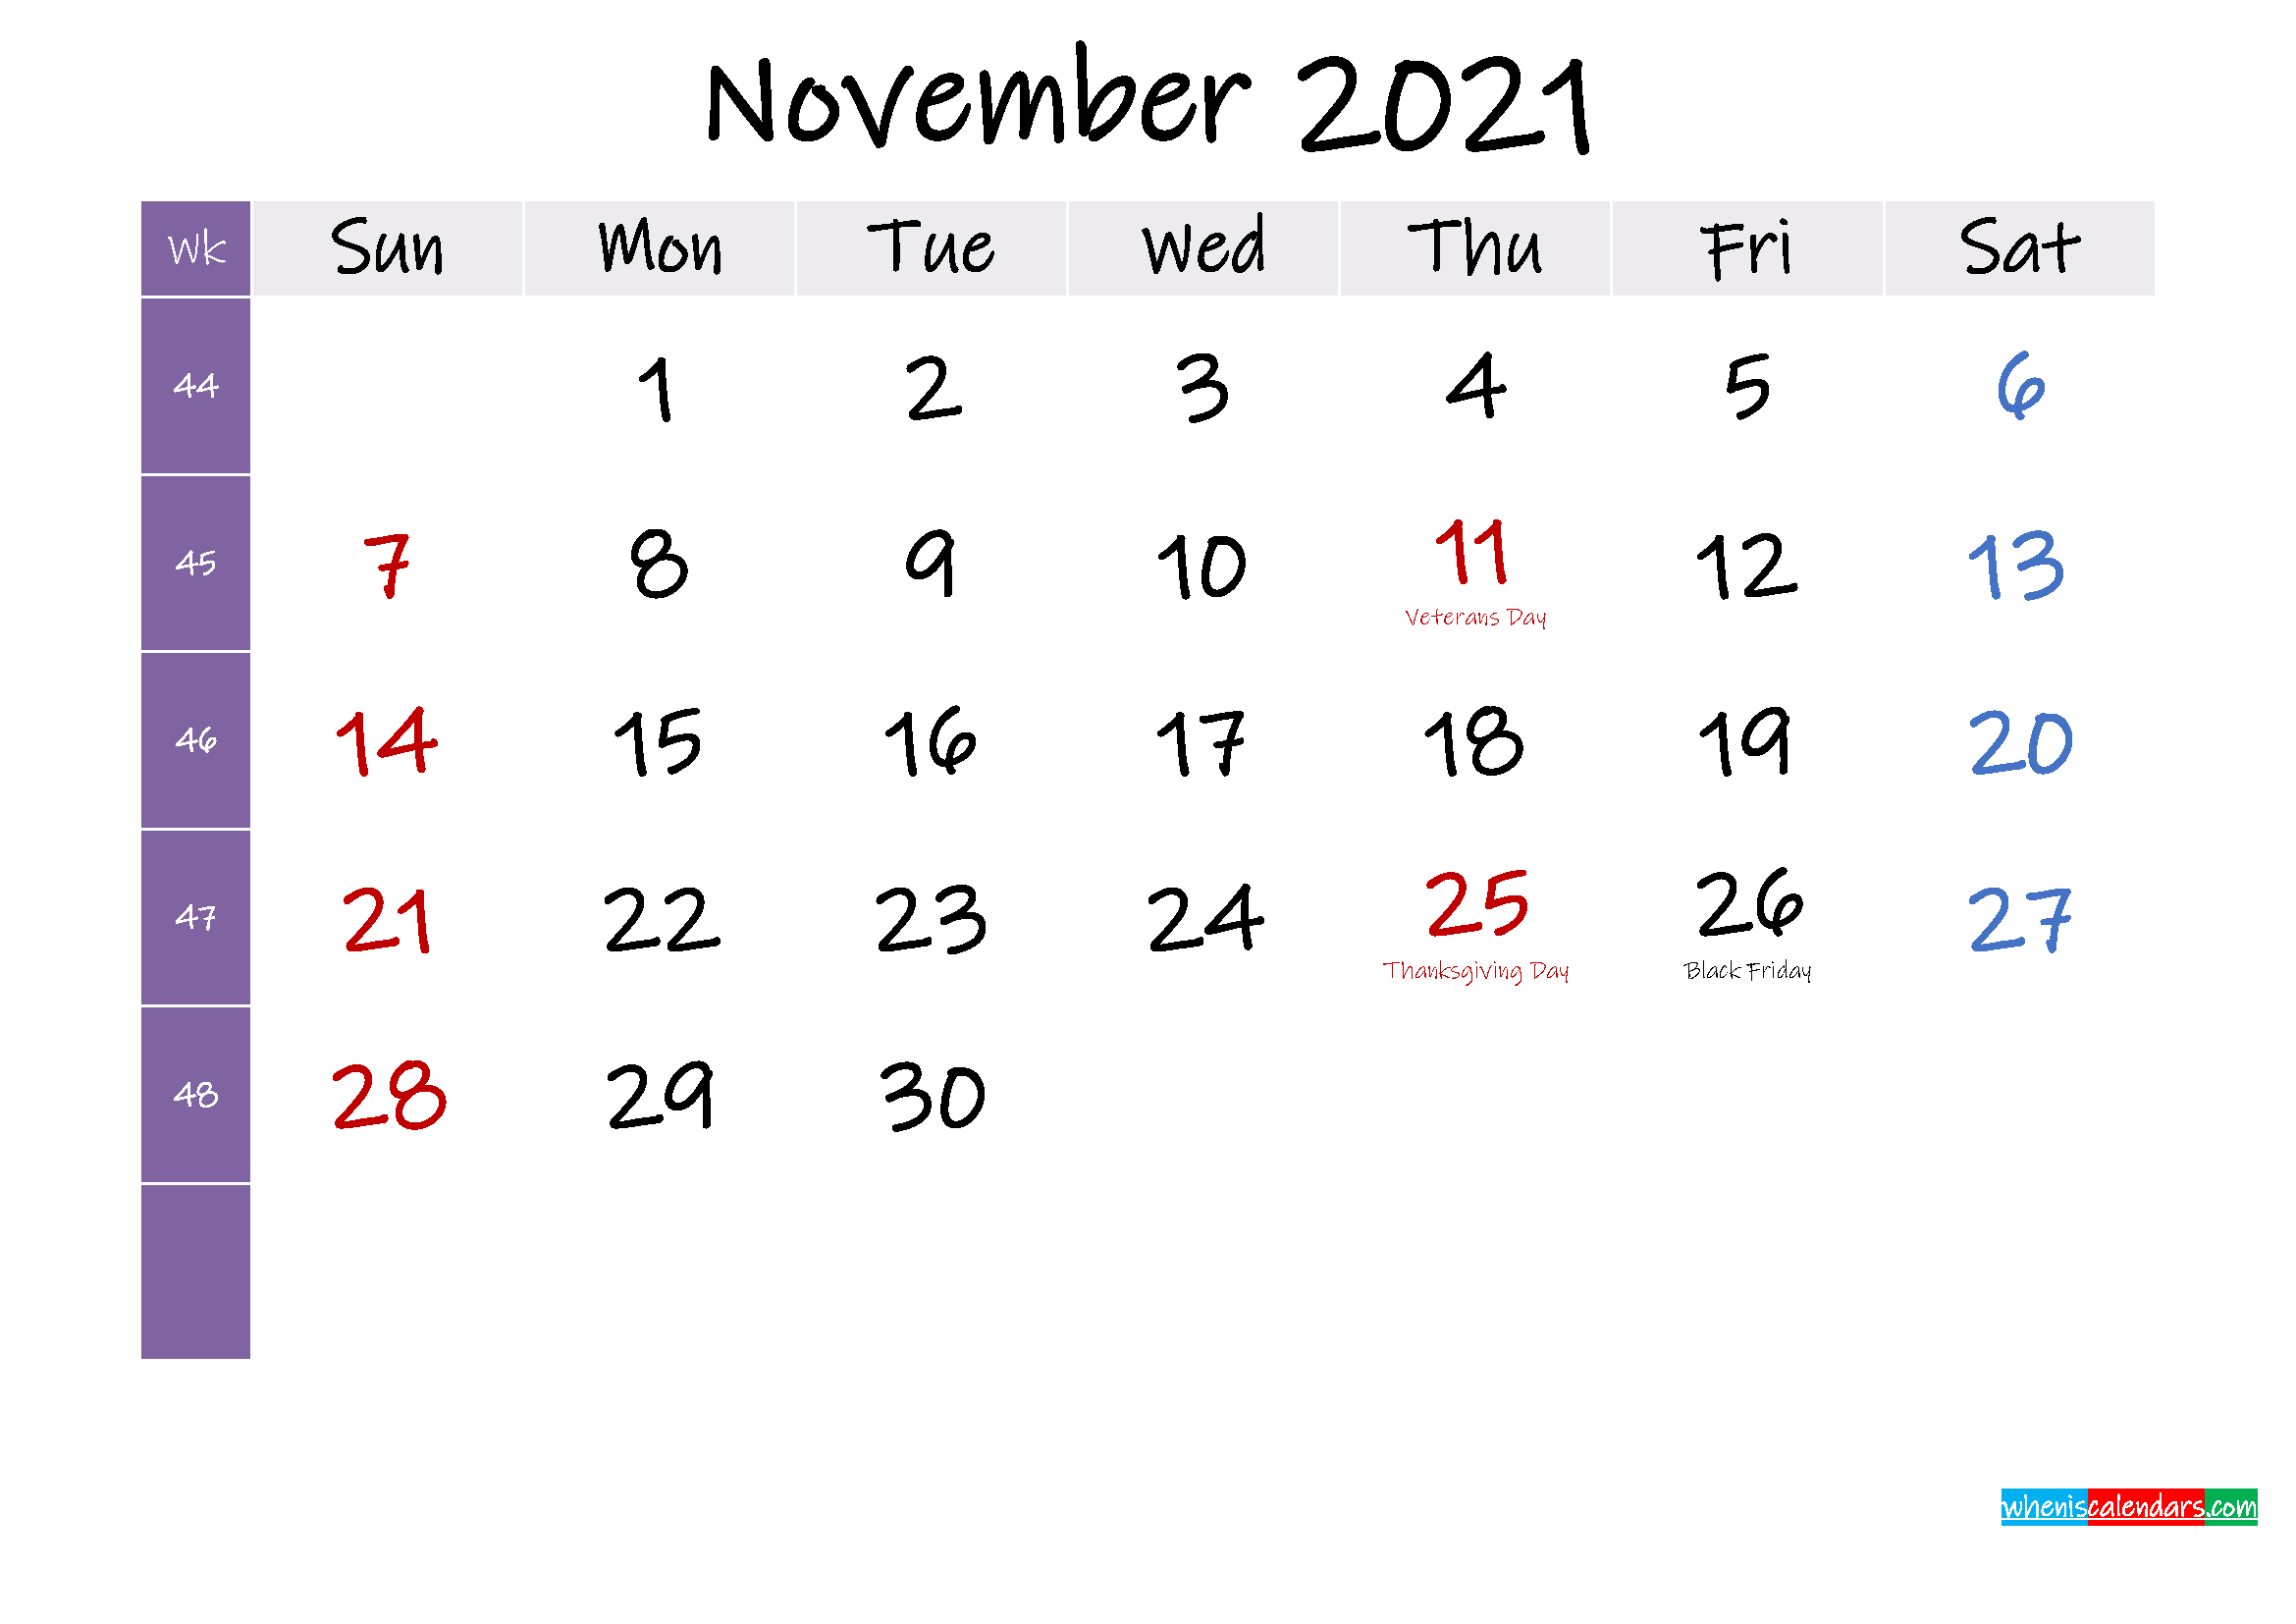 November 2021 Free Printable Calendar with Holidays